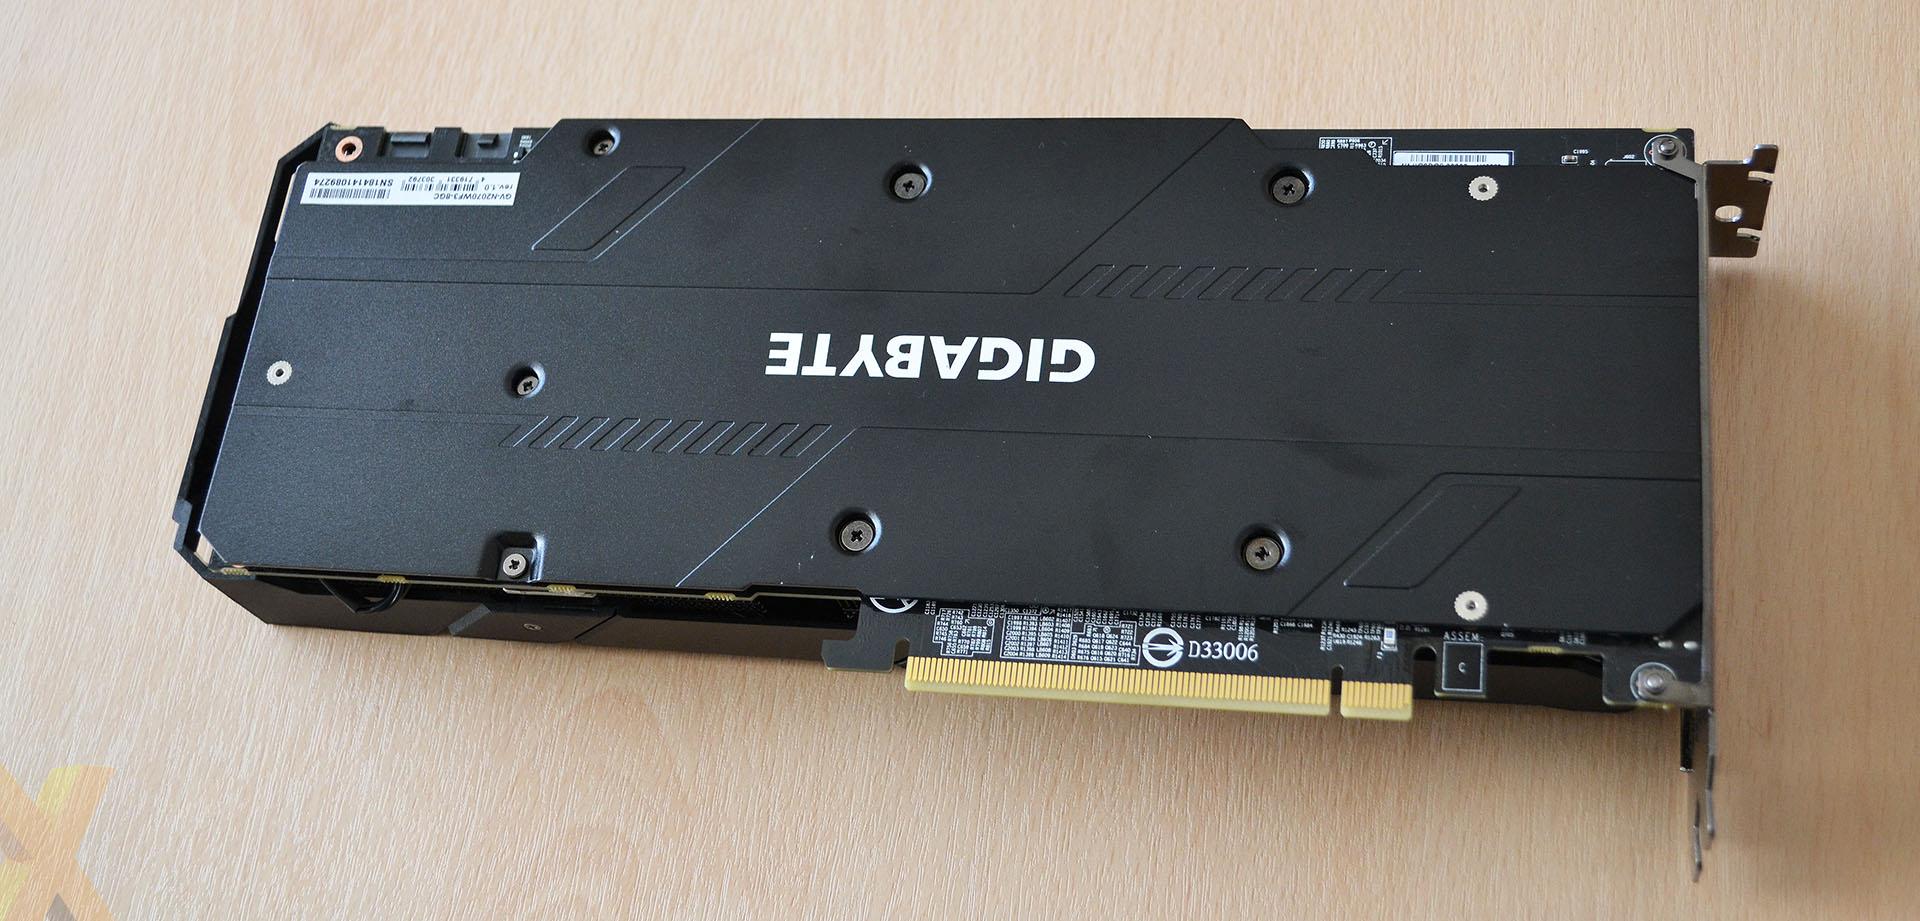 Review: Gigabyte GeForce RTX 2070 WindForce - Graphics - HEXUS.net